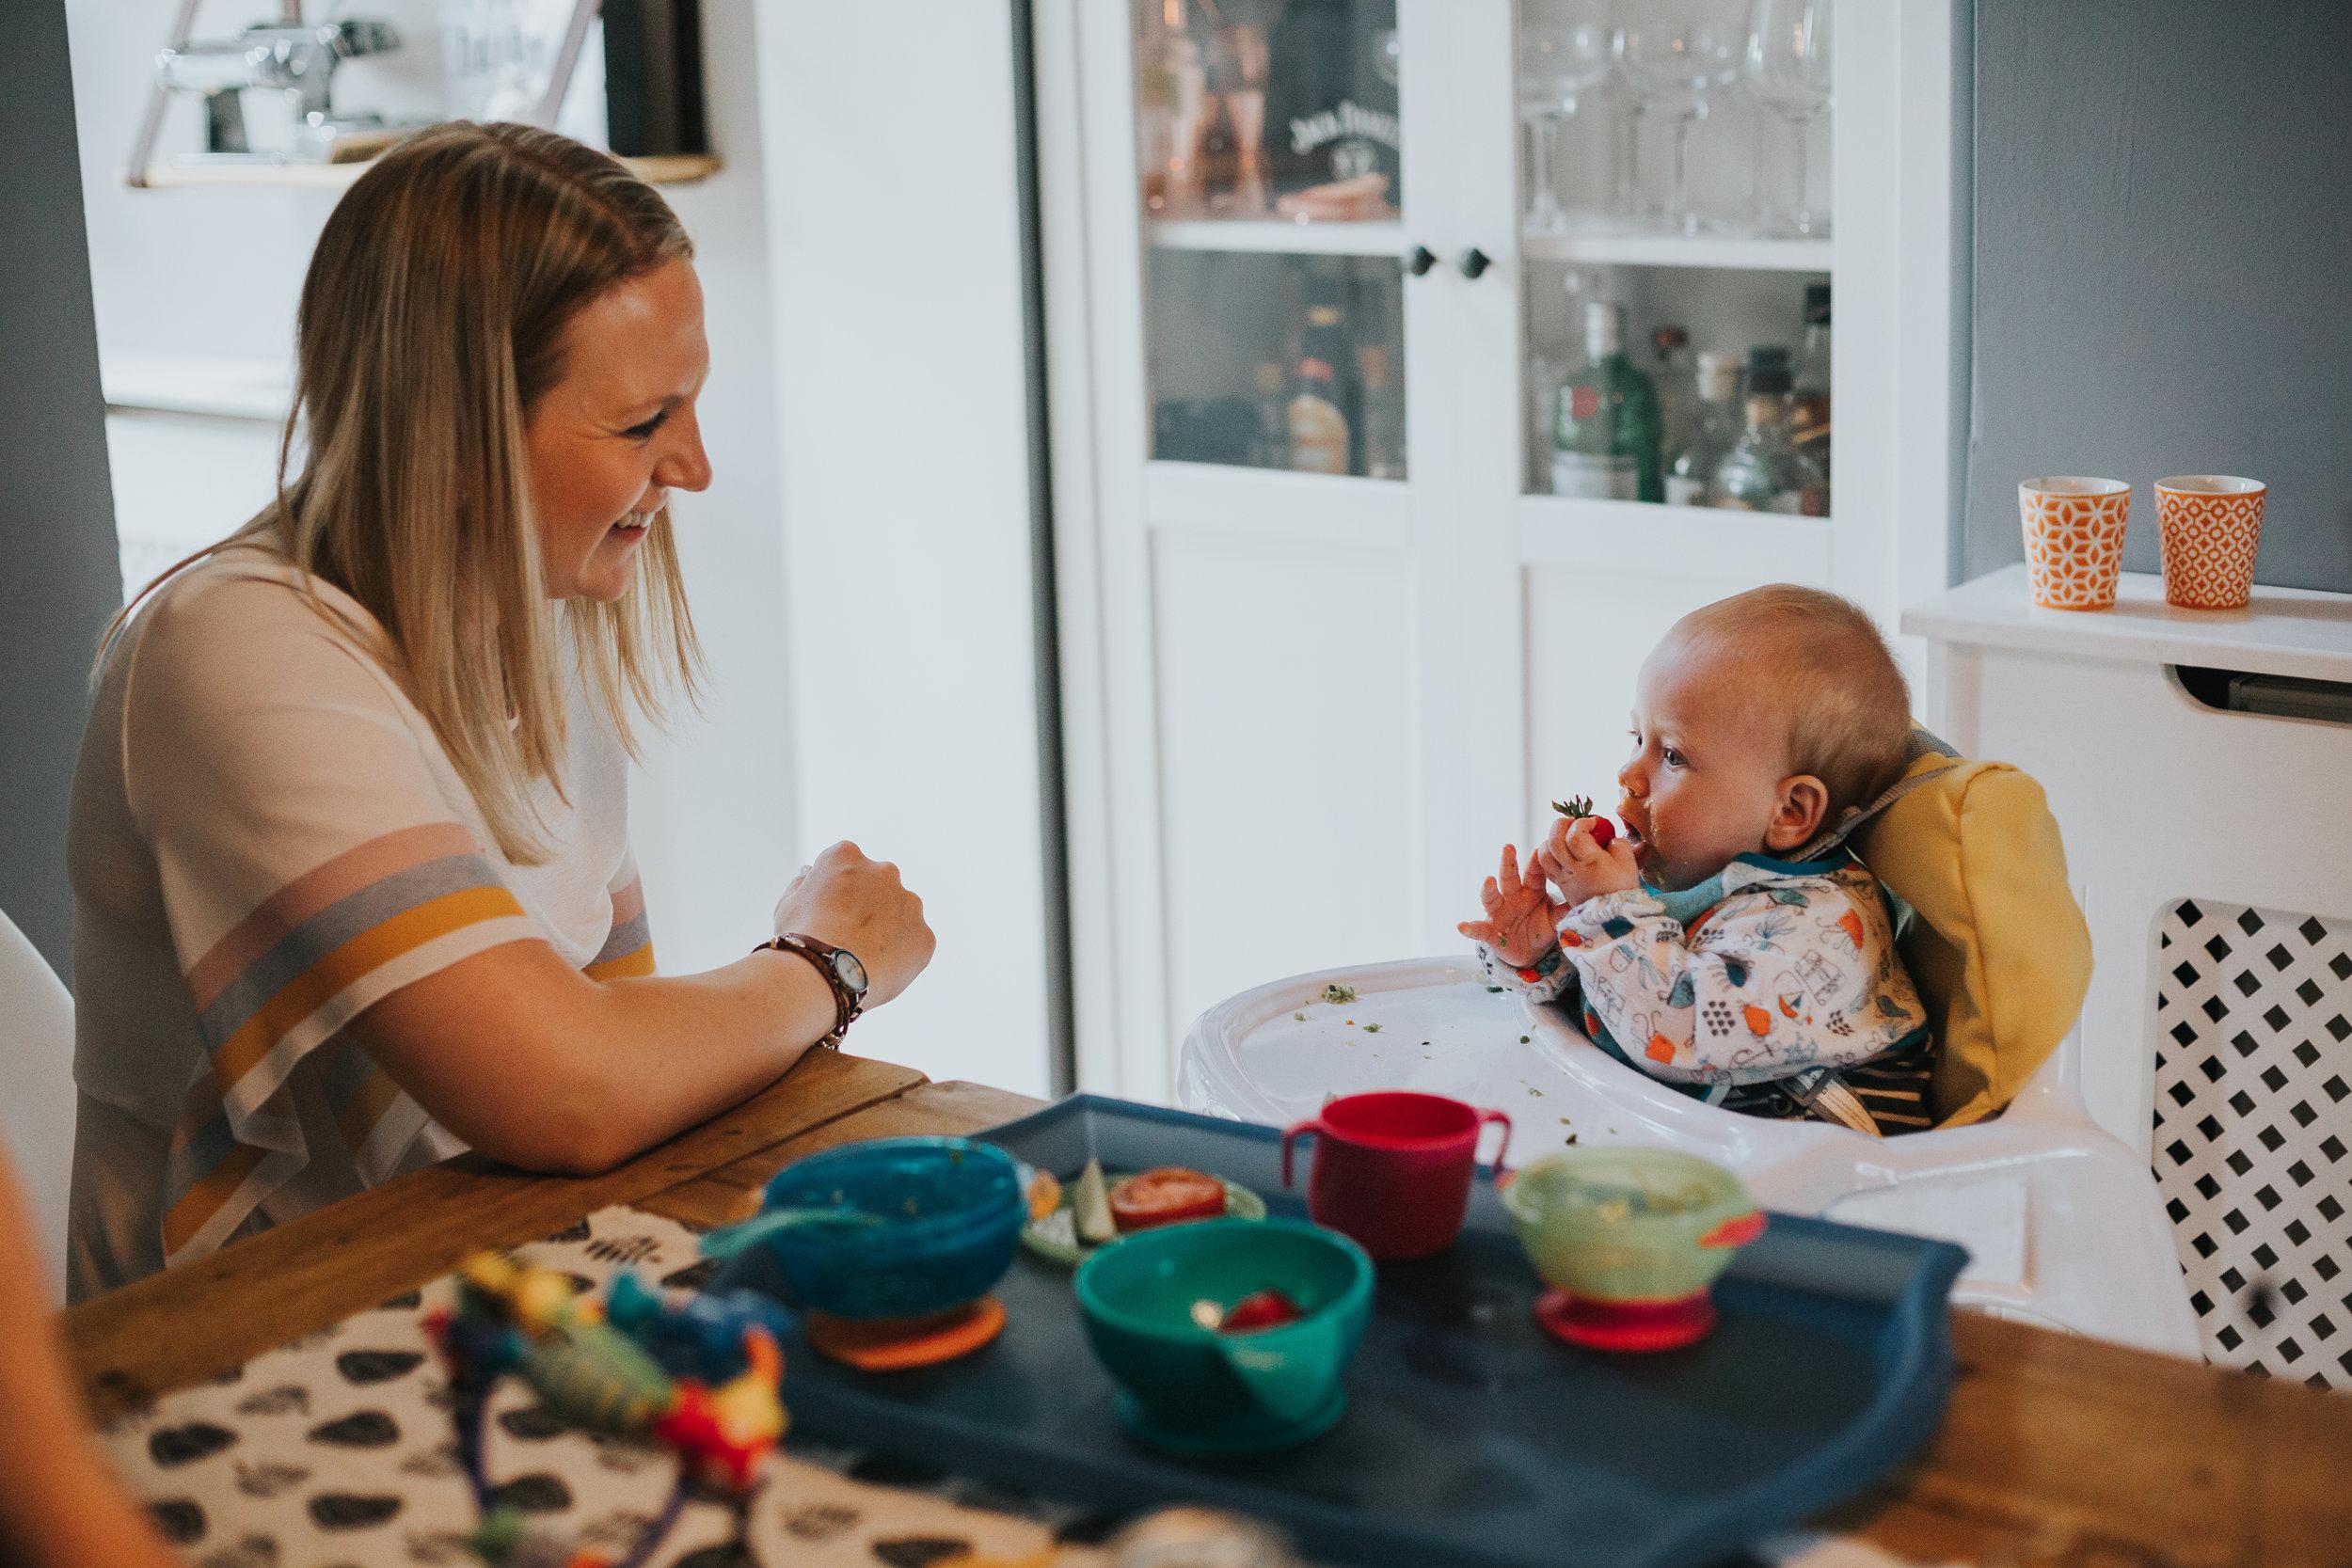 Mum watches baby eating smiling.